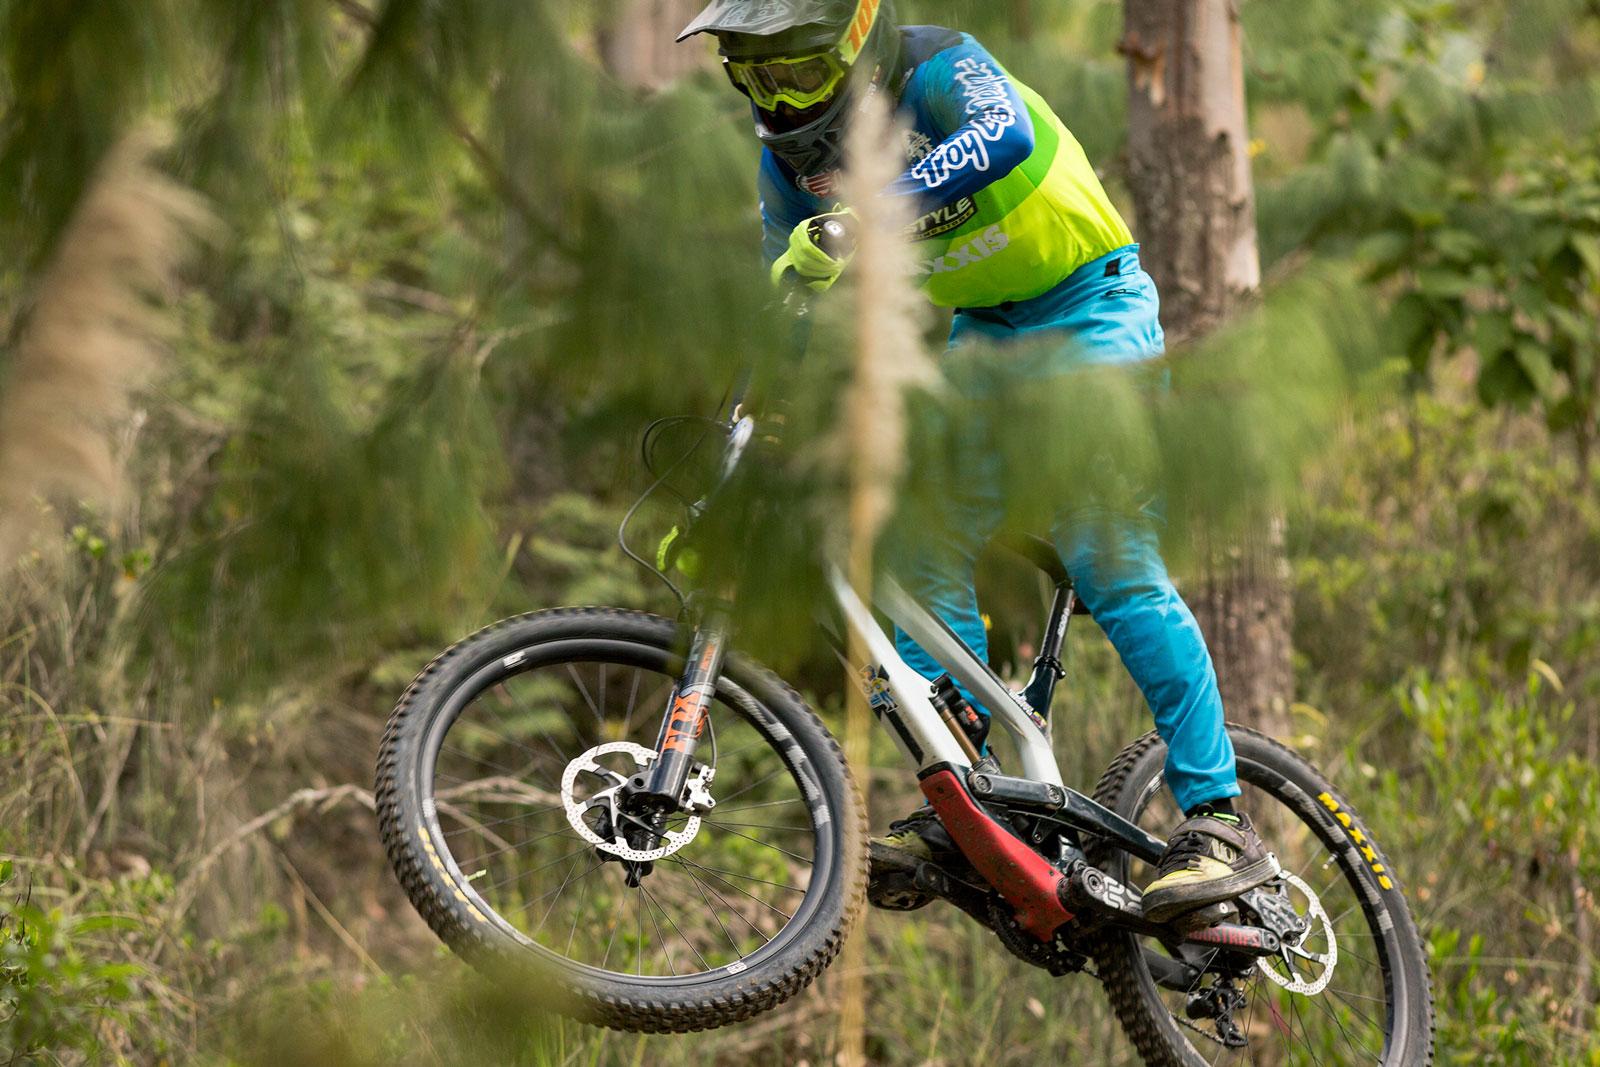 Rider_OSCAR-BRAVO-JARAMILLO2_PH_AleJaneta